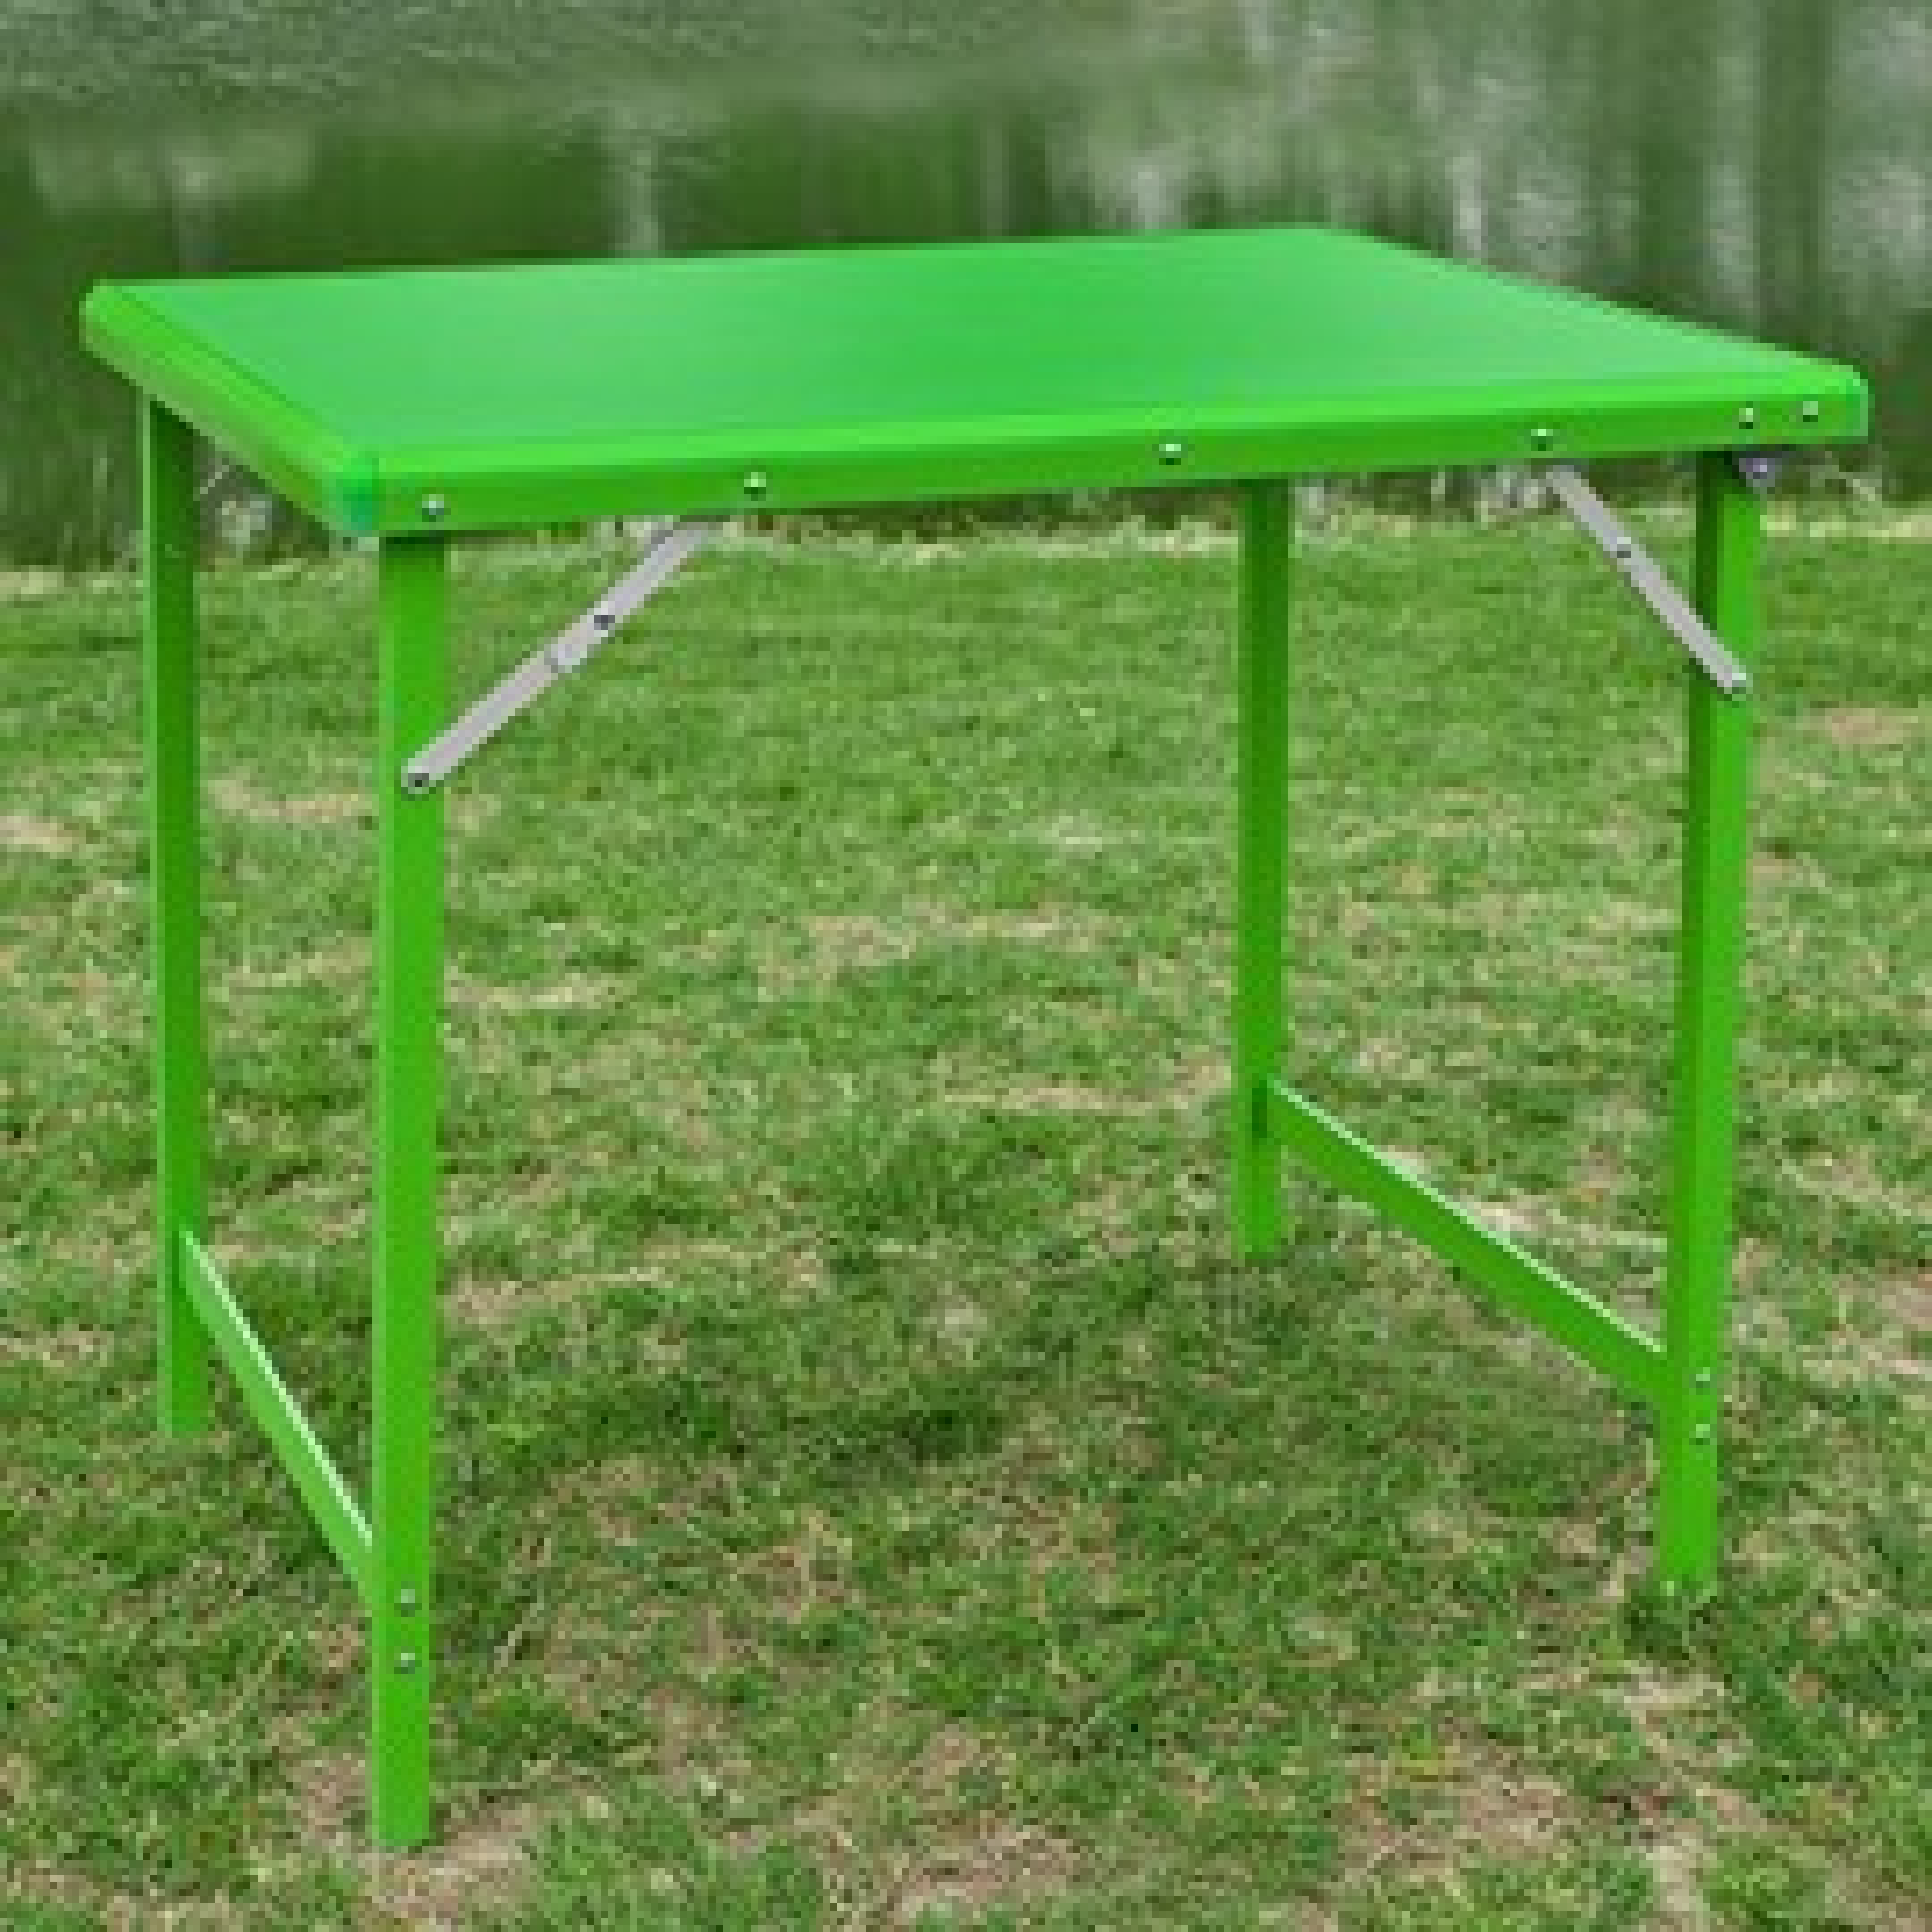 Table camping pliable portable table pliante de jardin - Table camping buffet traiteur pliante portable ...